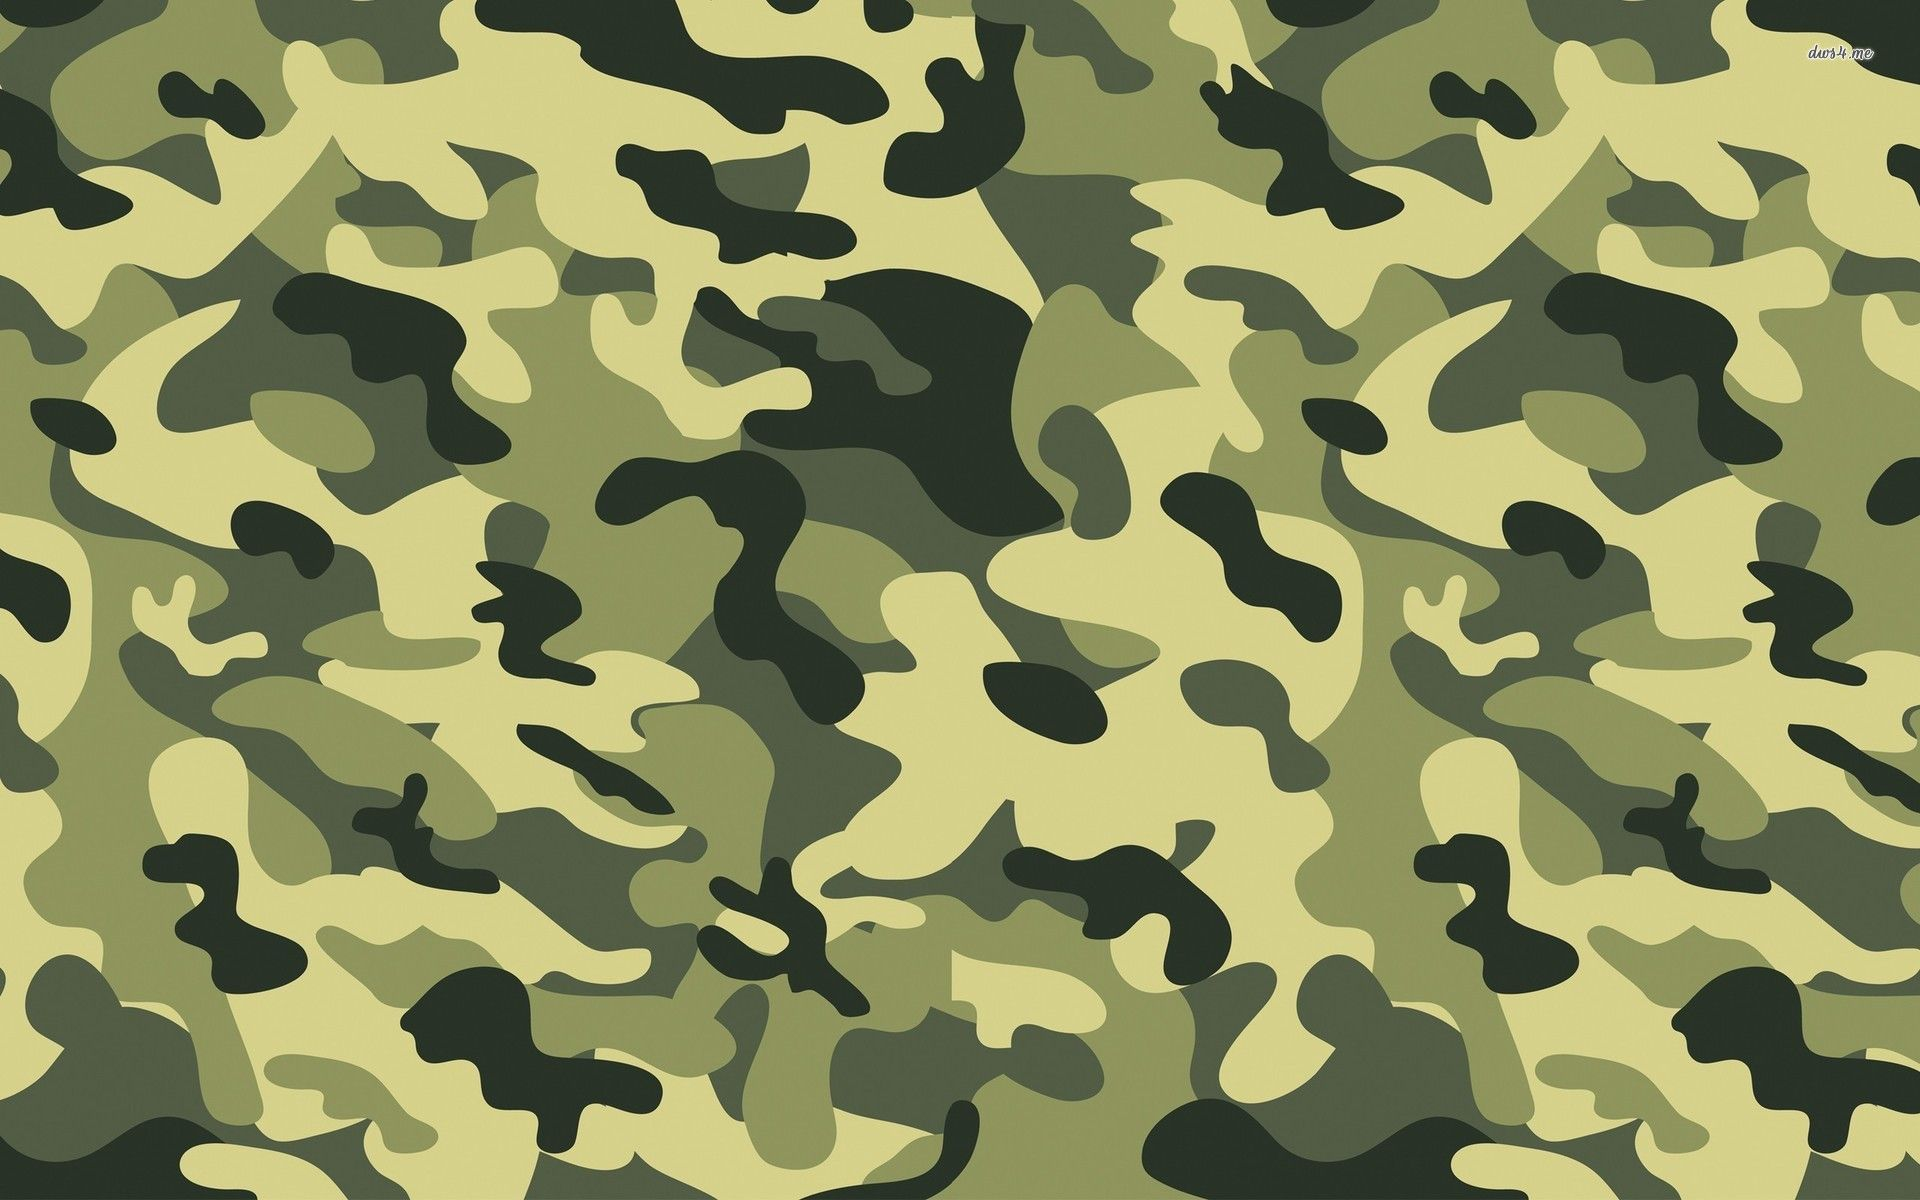 Camo Military Army Wallpaper Camo Wallpaper Camouflage Wallpaper Army Wallpaper